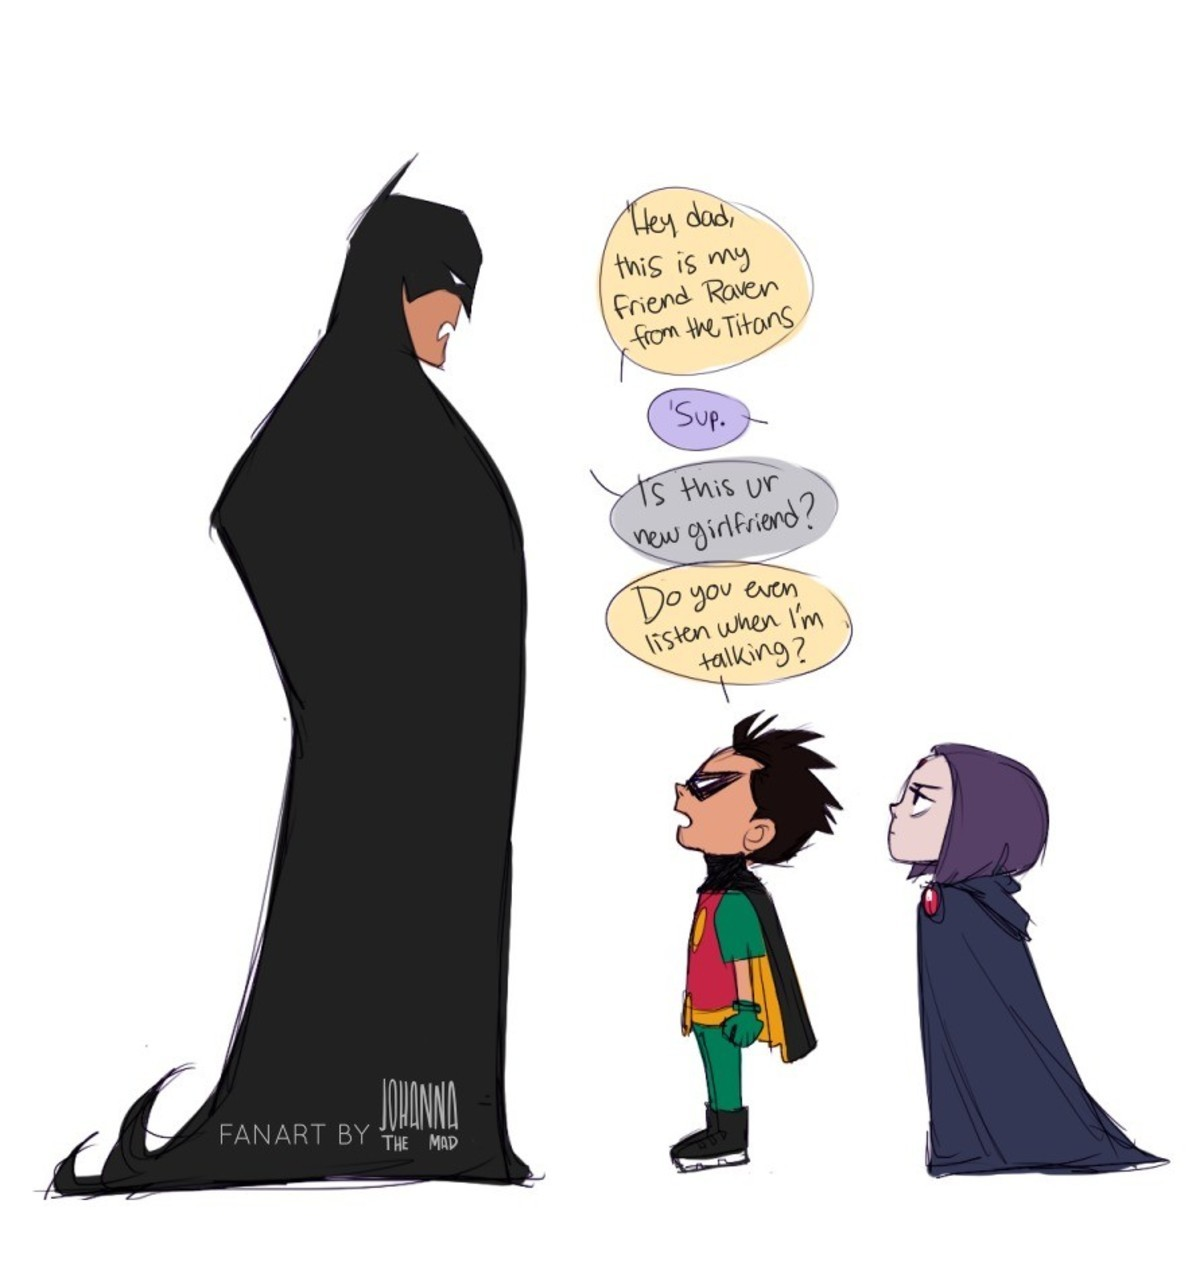 smol birb. .. Batman just gave her his Dick.